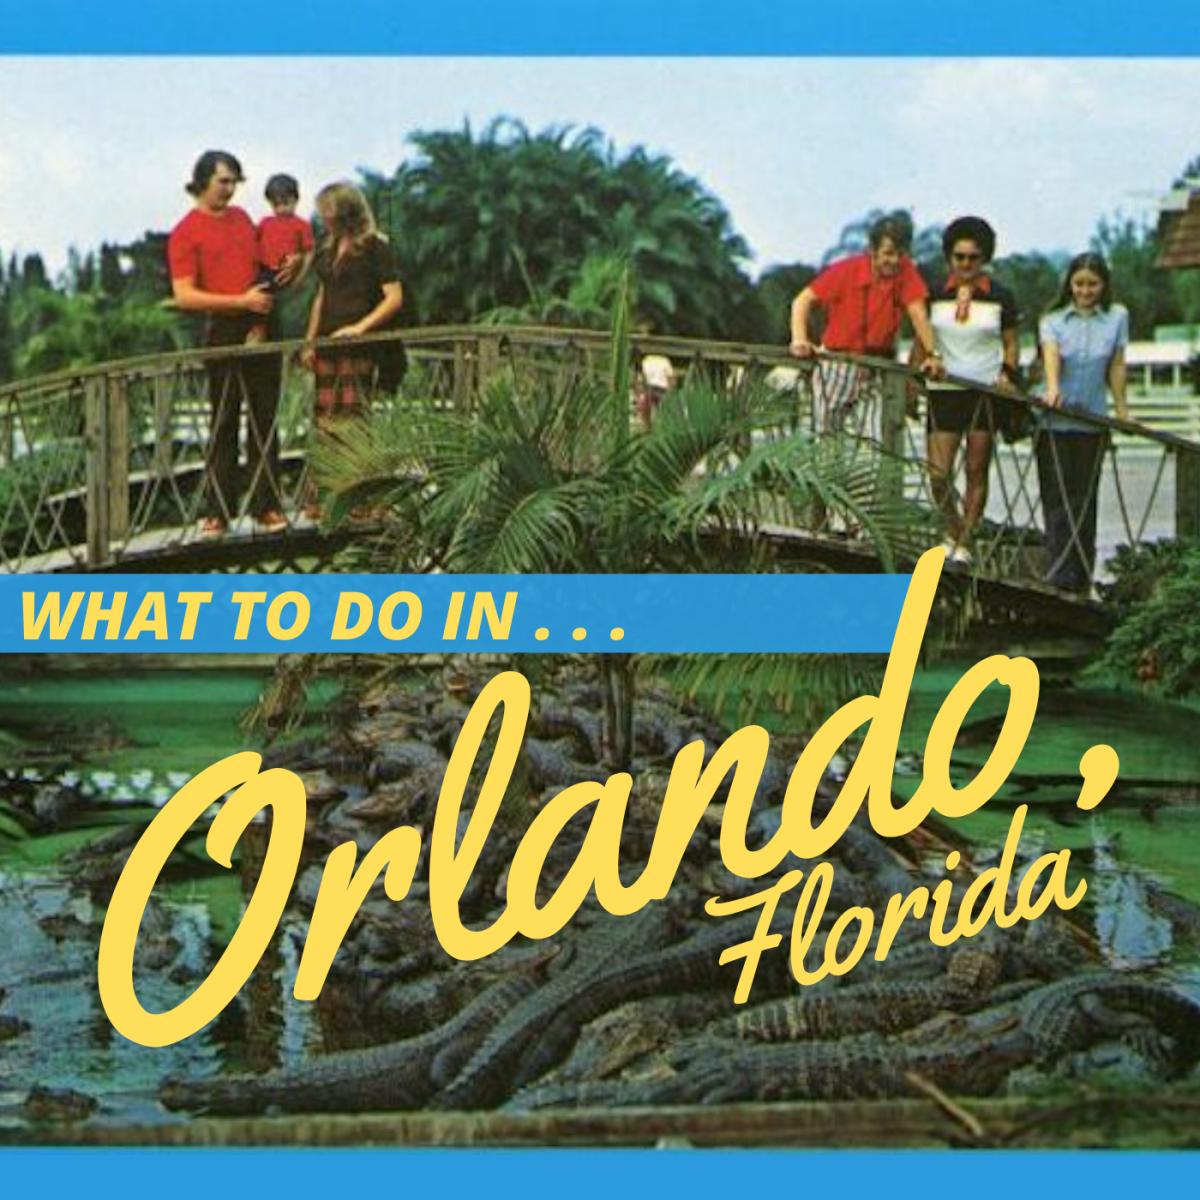 12 Fun Things to Do in Orlando, Florida